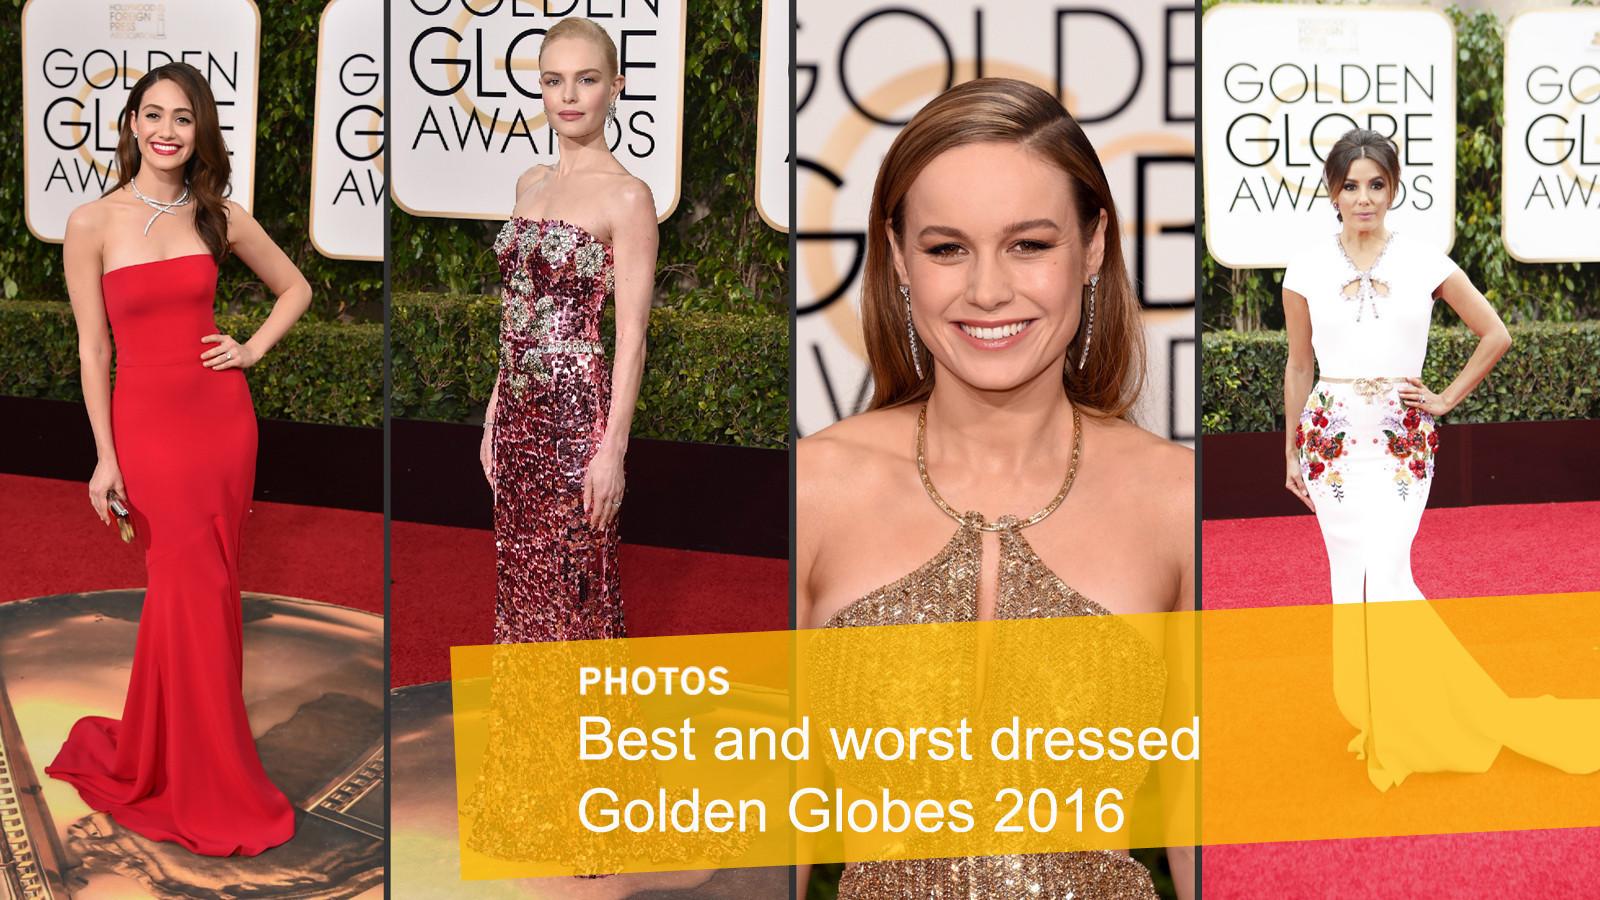 Golden Globes | Euro Palace Casino Blog